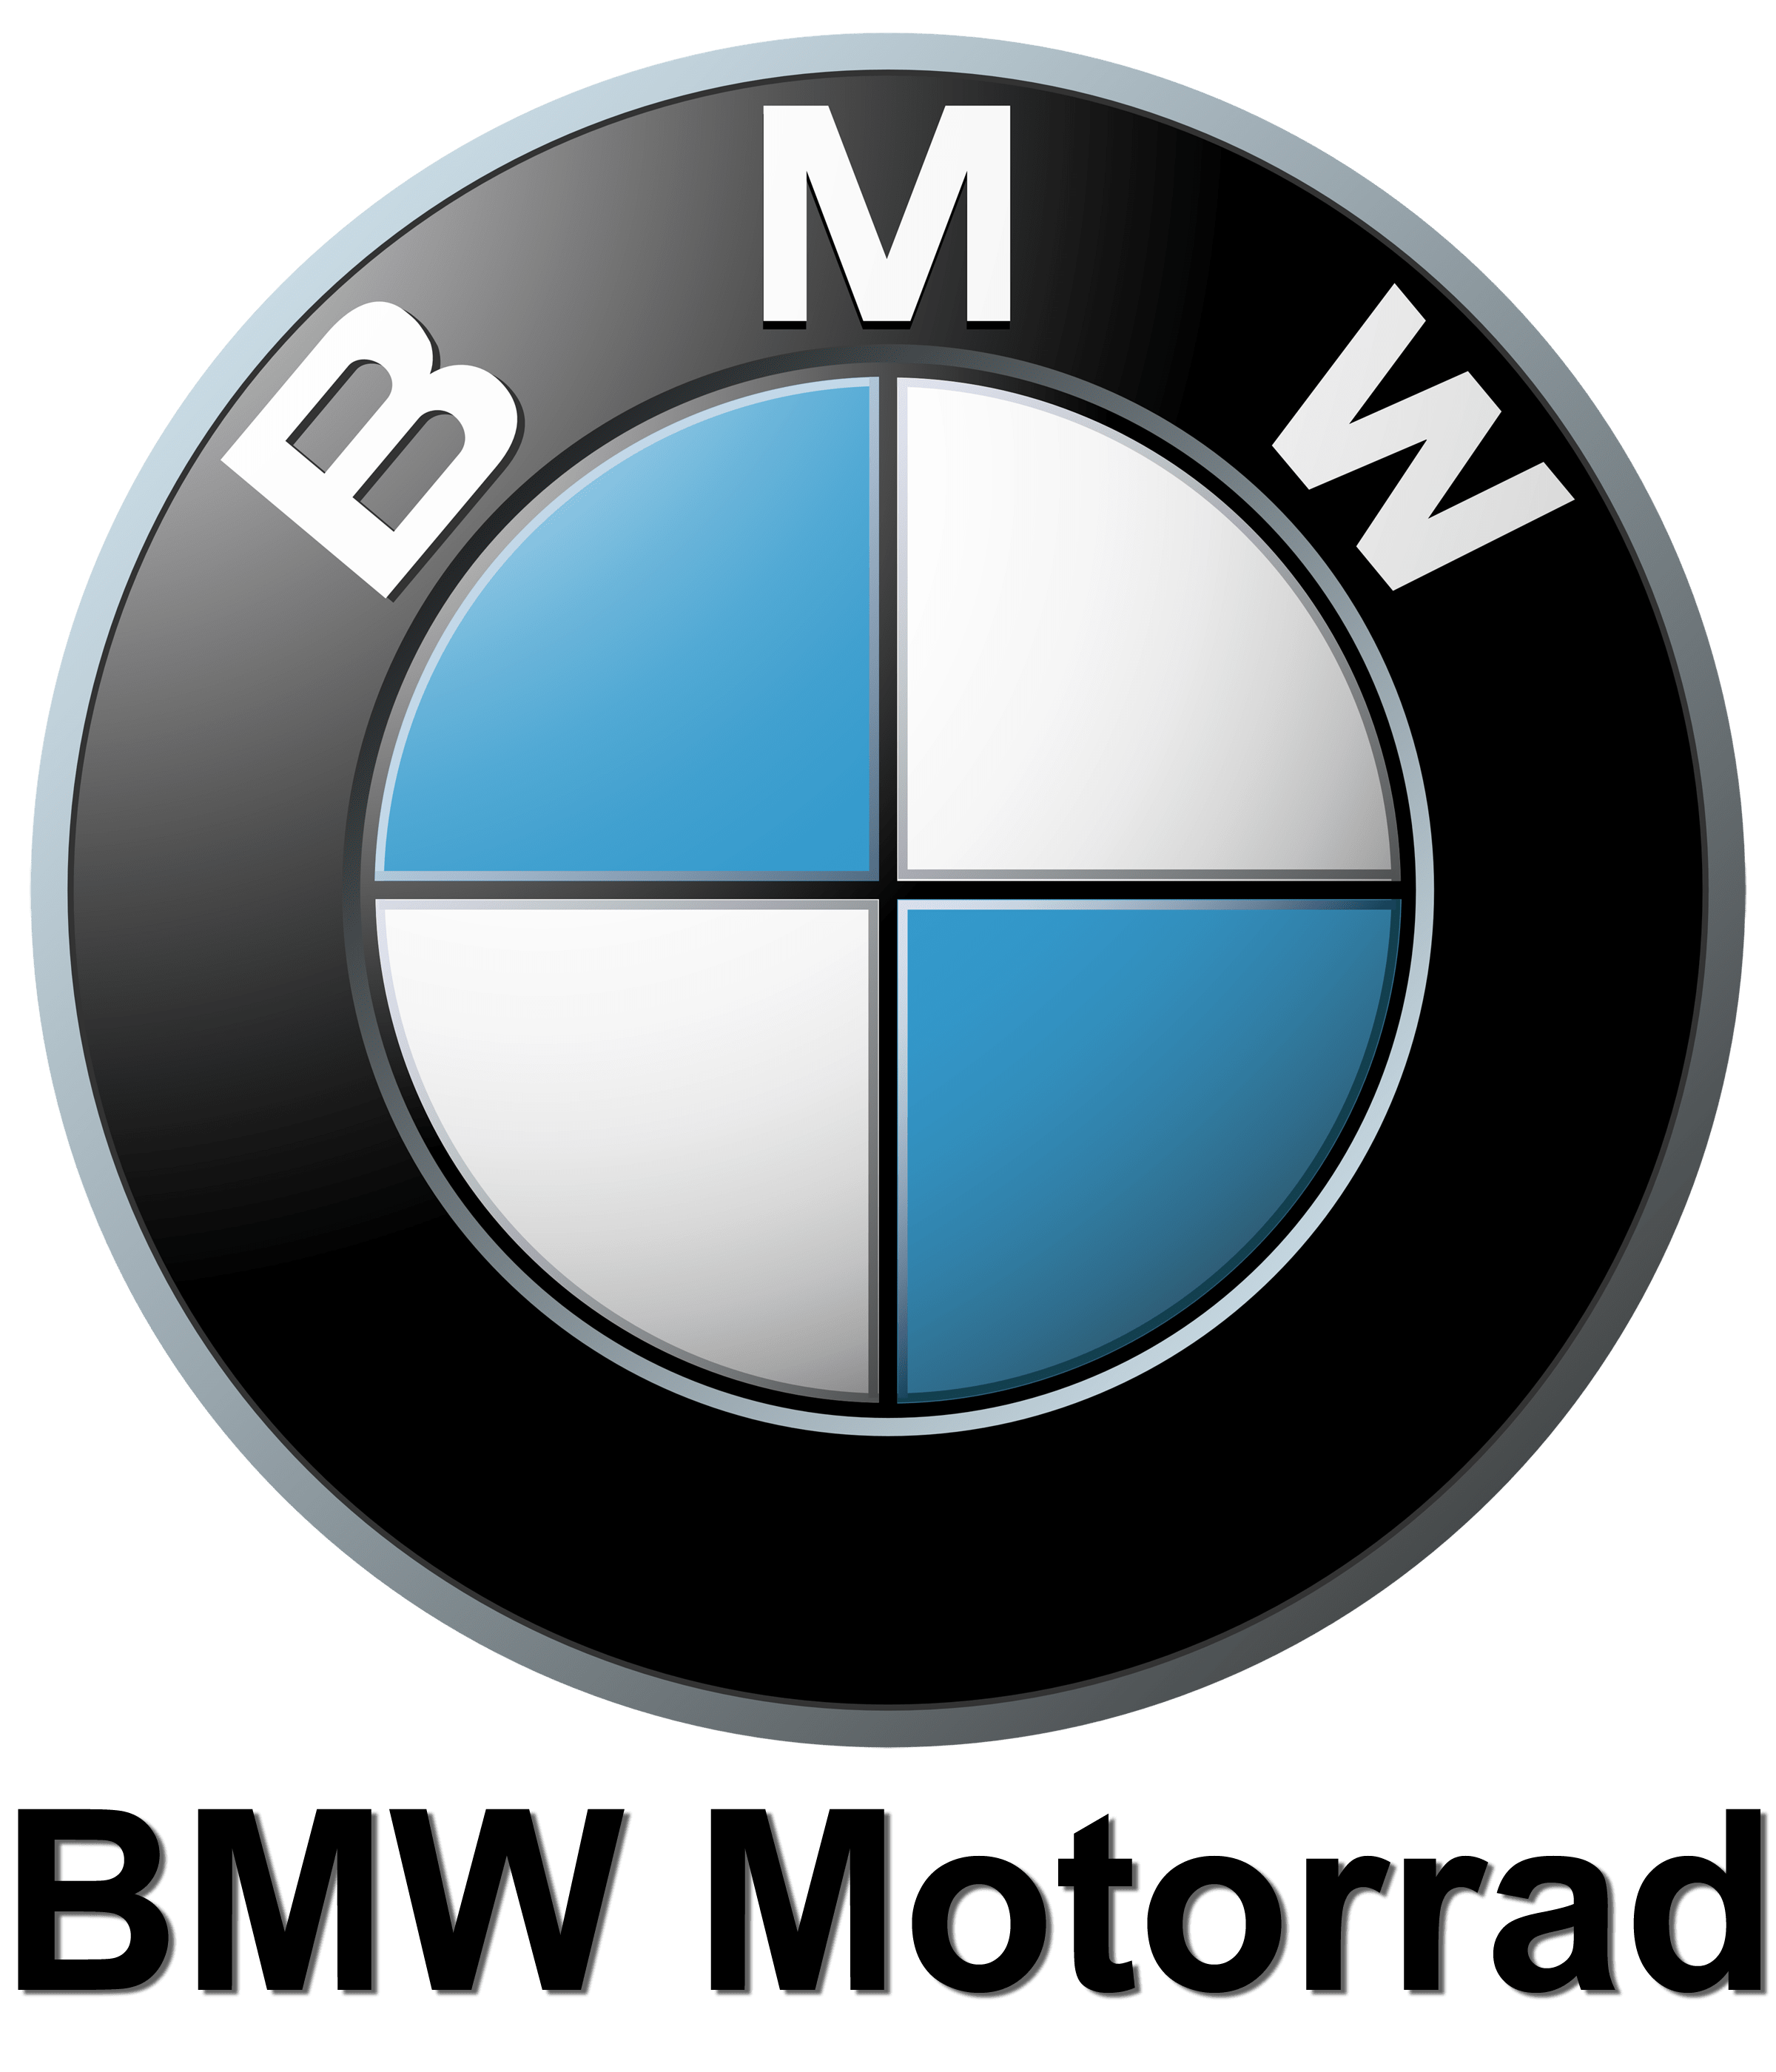 BMW-Motorcycle-Logo - Grahams Motorcycles